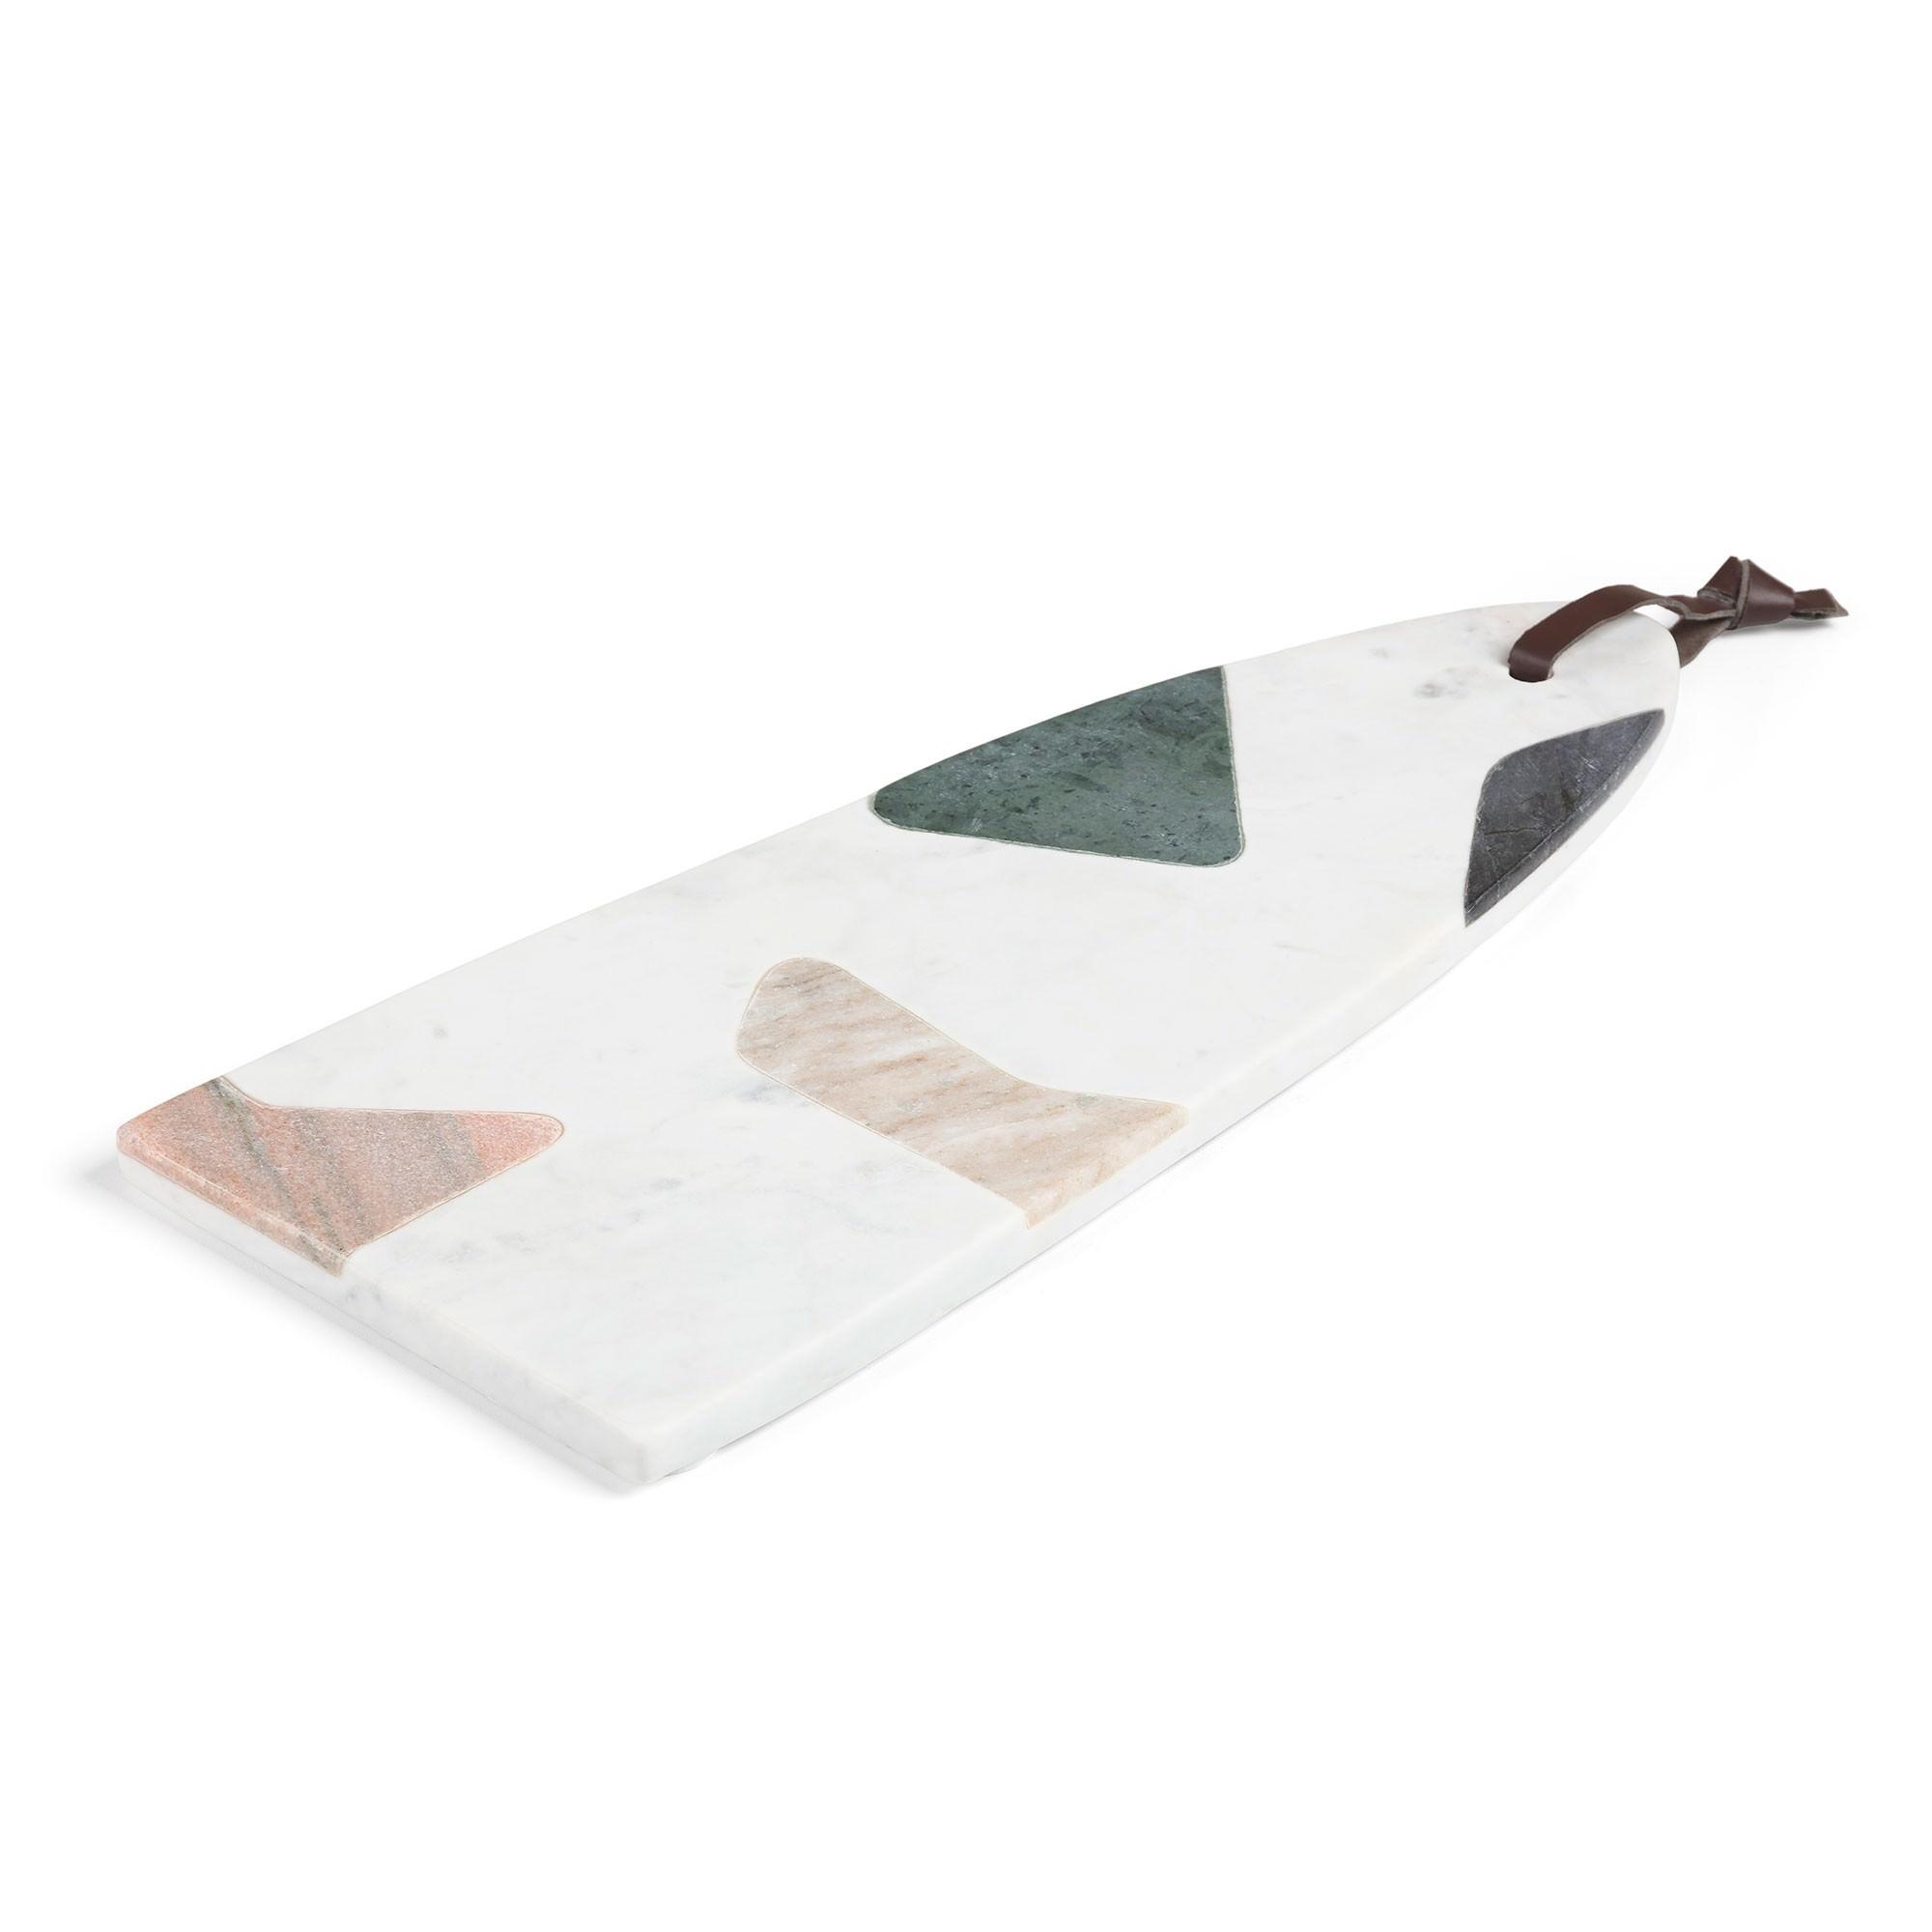 Ainsworth Marble Semioval Serving Board, 40x16cm, Multi